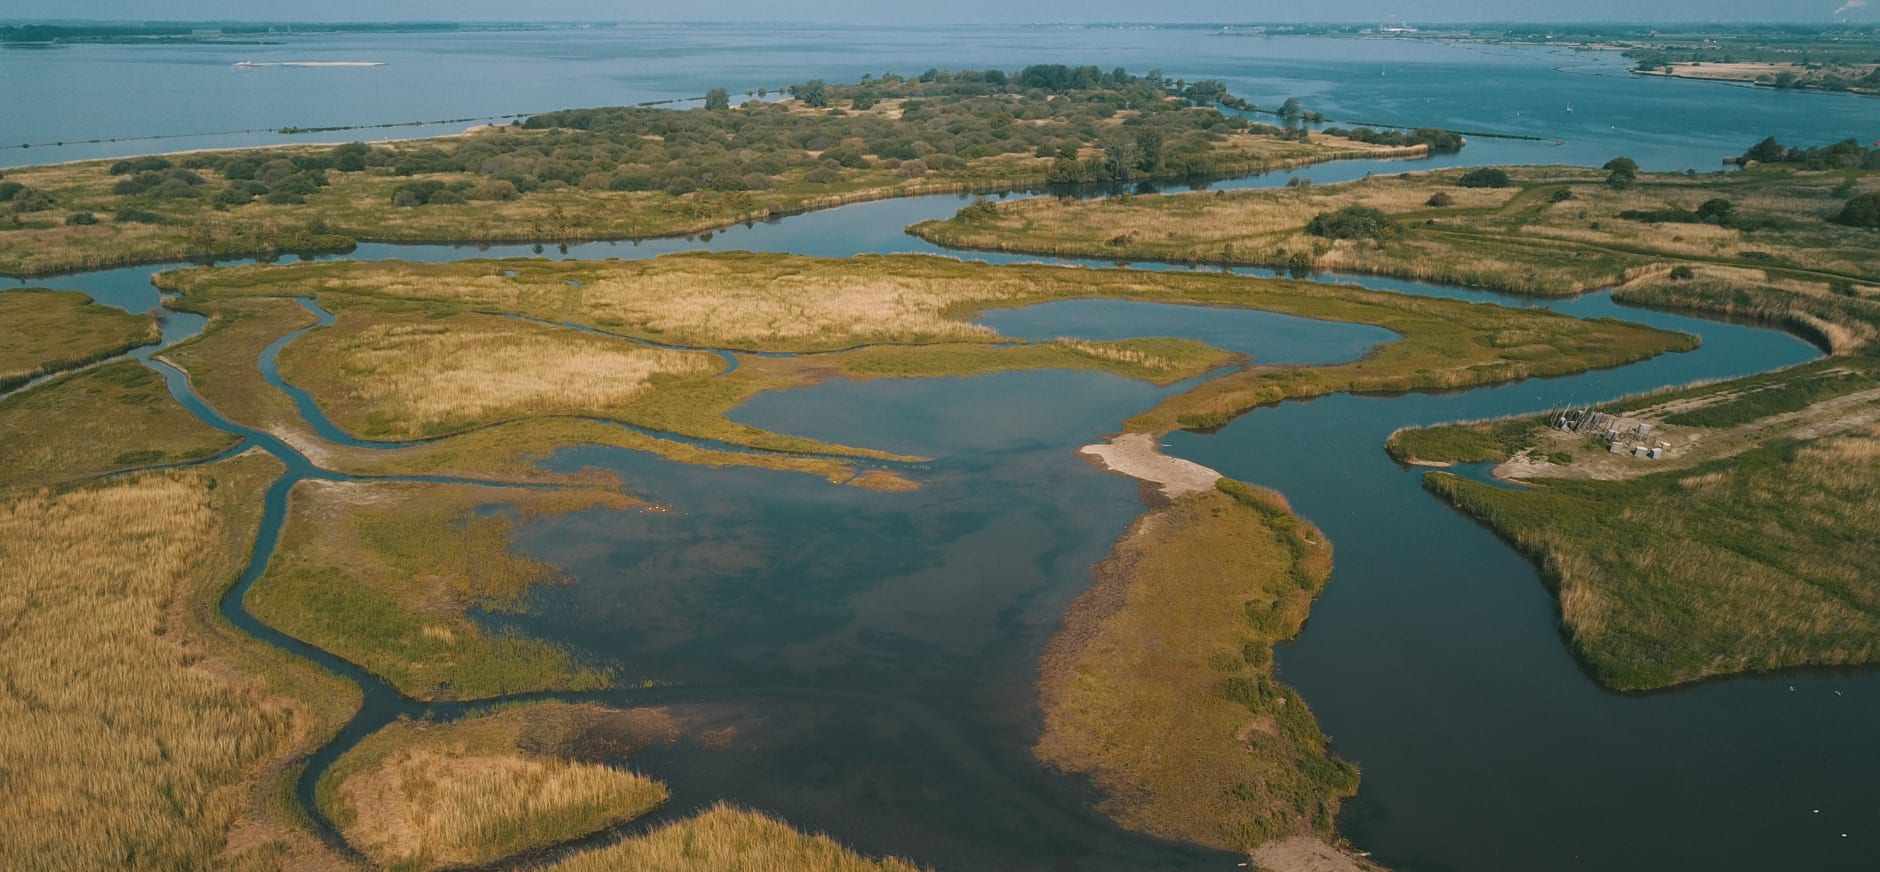 Drone foto Korendijkse Slikken na natuurherstel